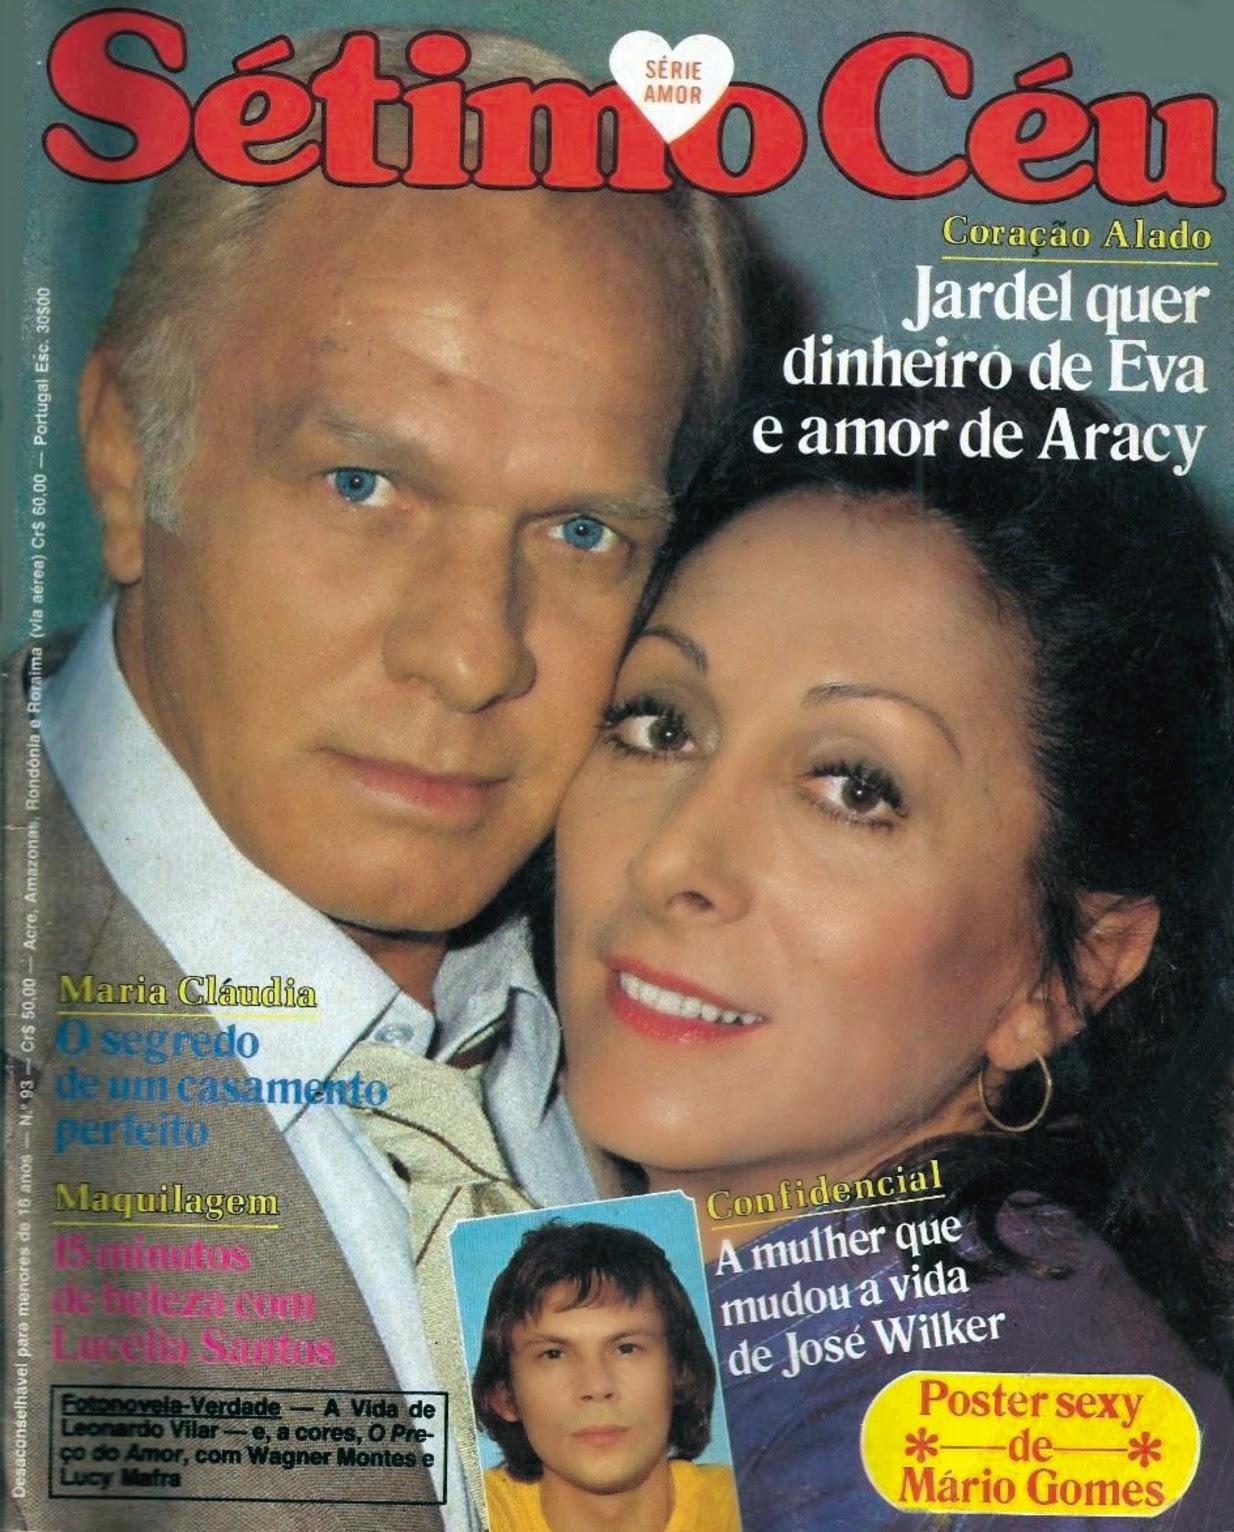 Aracy Balabanian Delightful astros em revista: aracy balabanian nas capas de revistas